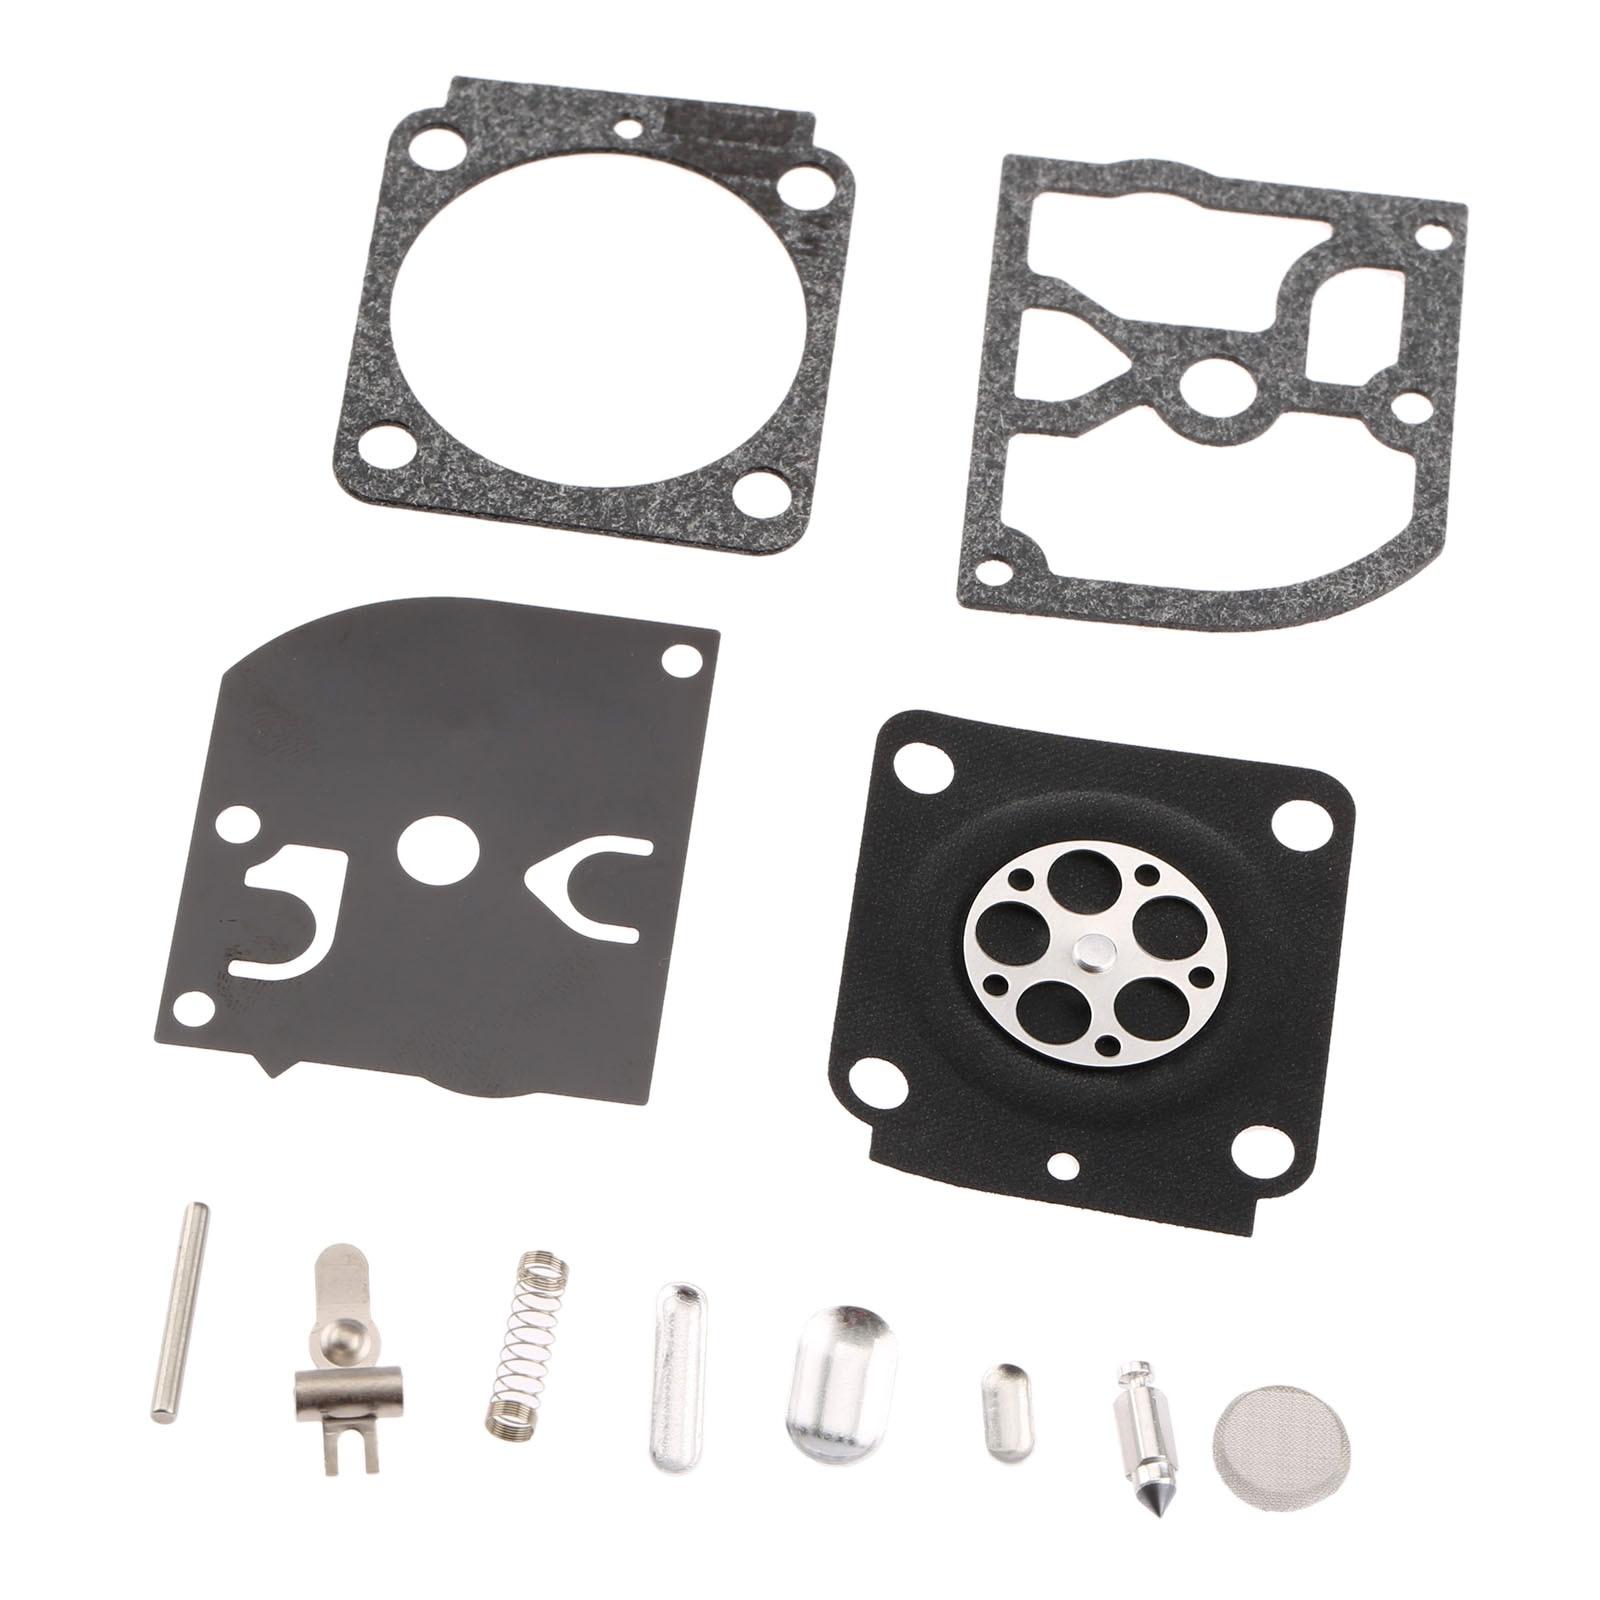 Carburetor Repair Kit Chainsaw Trimmer Parts RB-100 Gasket Diaphragm For Zama STIHL HS45 FS55 FS38 BG45 MM55 TILLER ZAMA C1Q